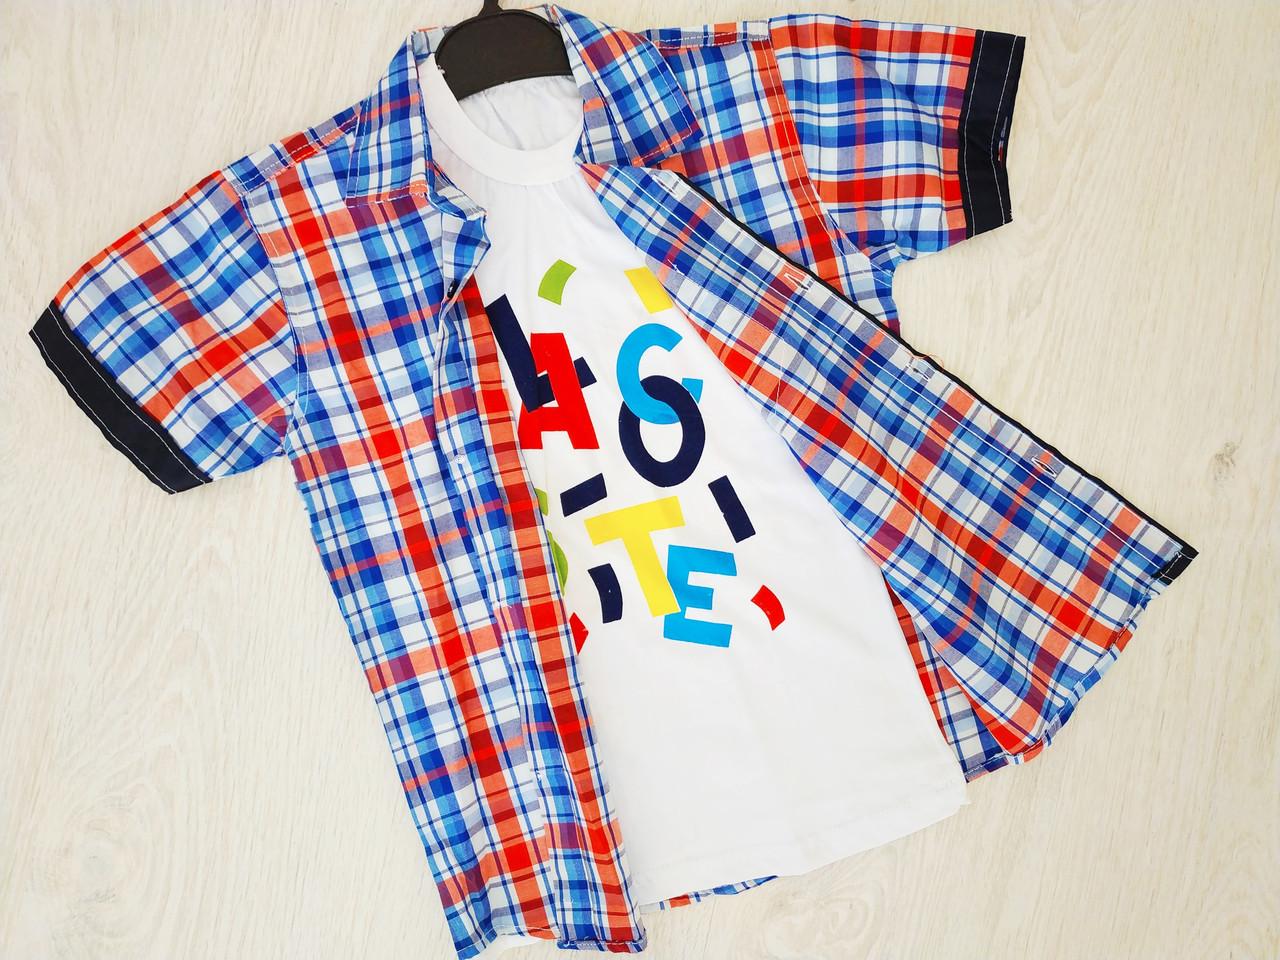 Рубашка + футболка для мальчика, Турция, Babexi,  арт. 38561, 122-128 см